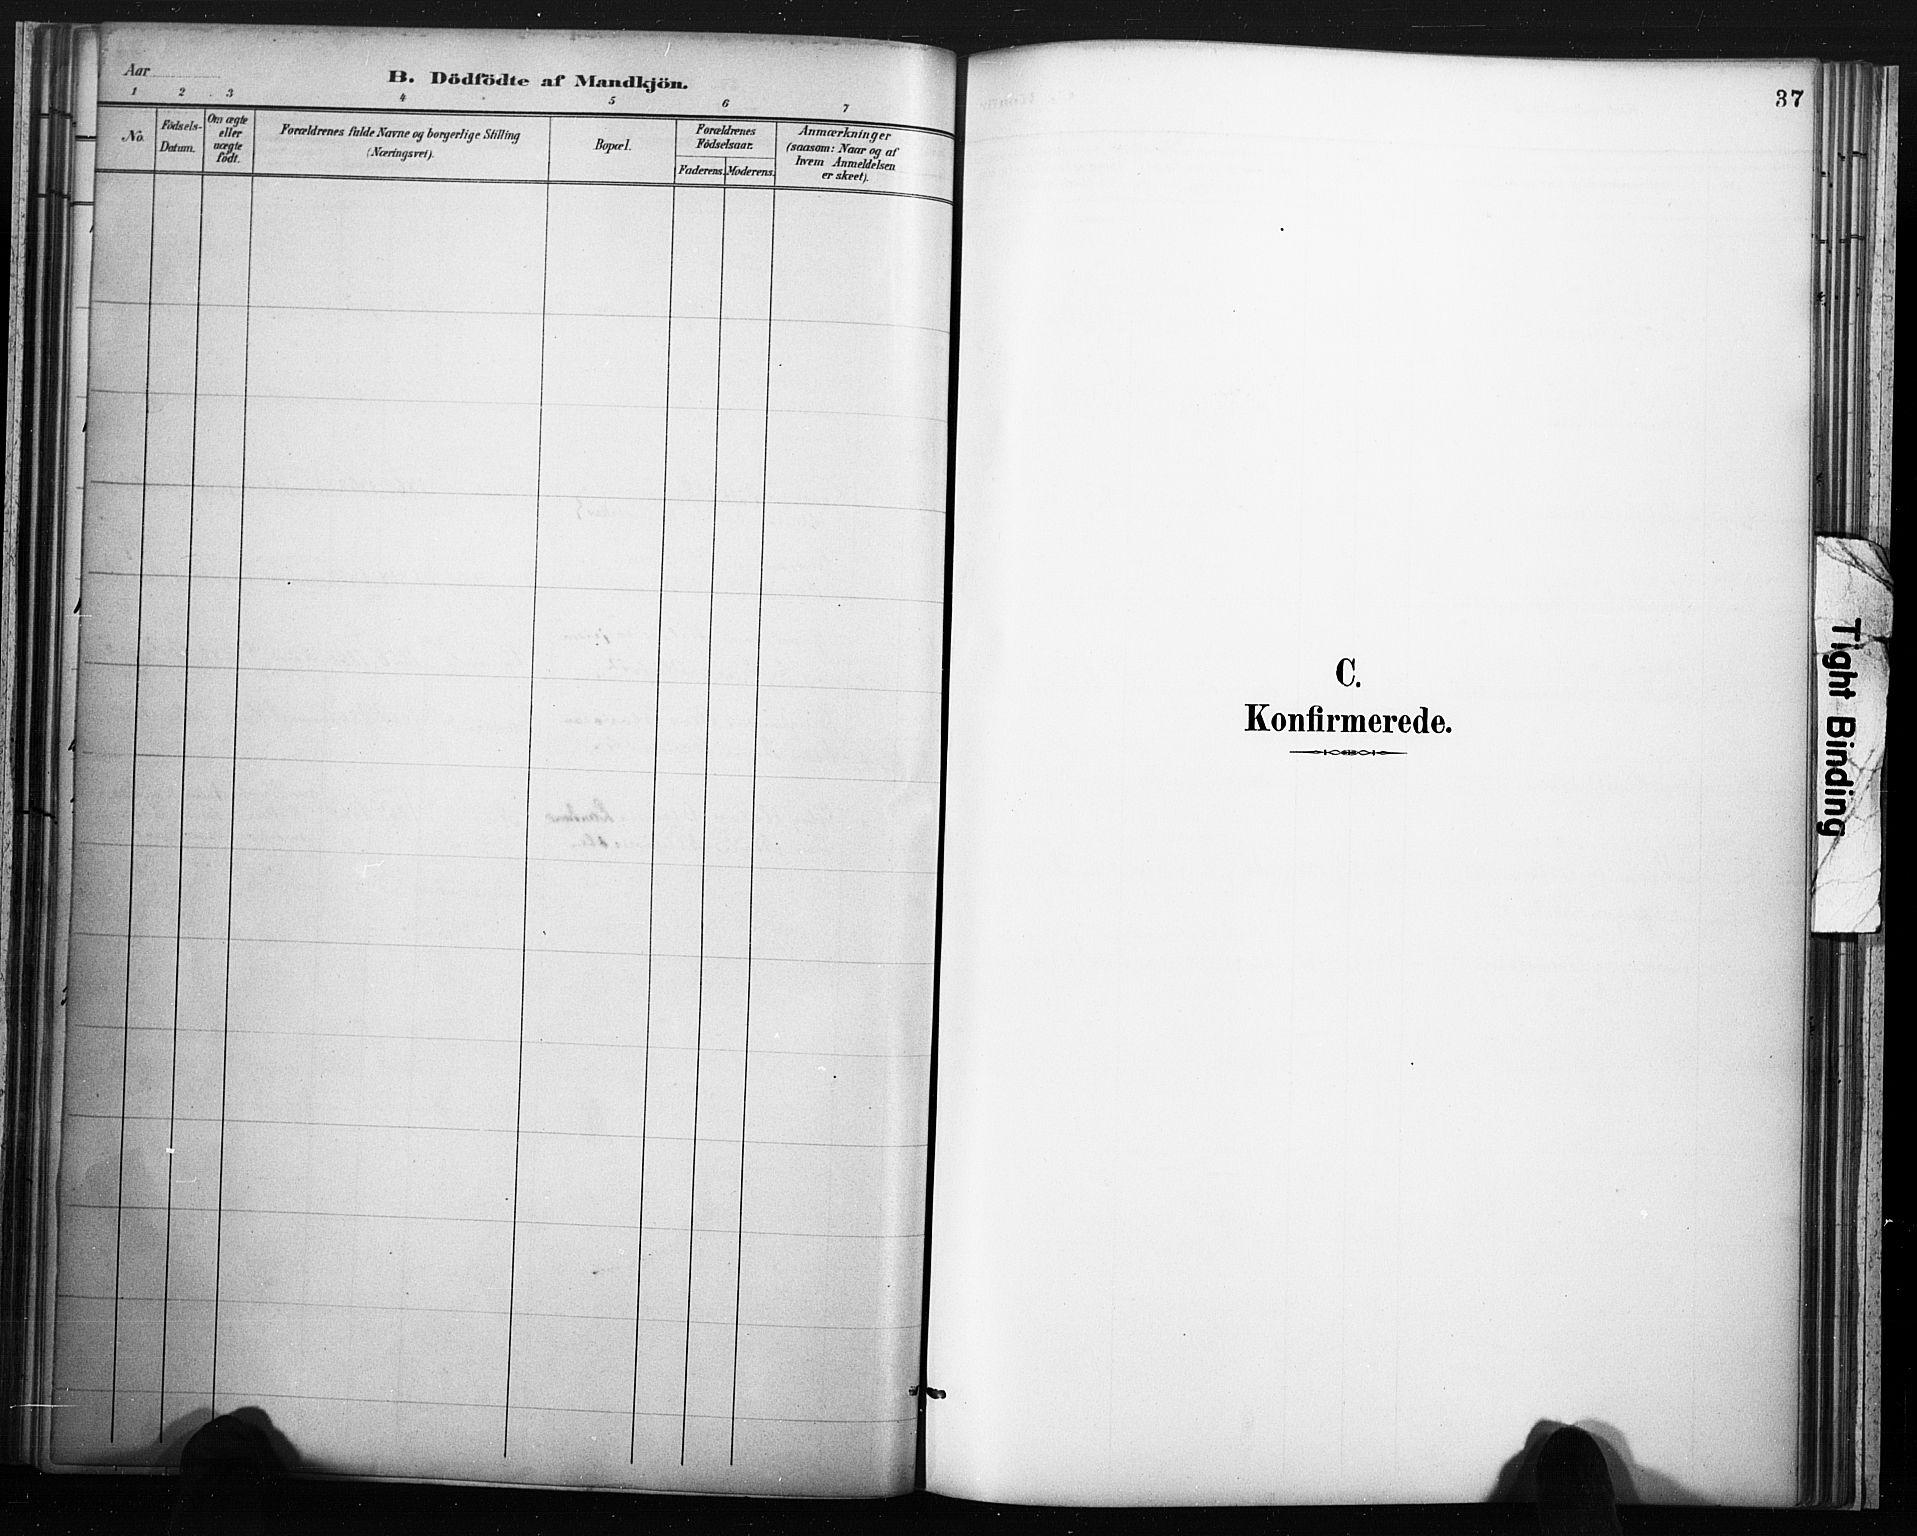 SAKO, Lårdal kirkebøker, F/Fc/L0002: Ministerialbok nr. III 2, 1887-1906, s. 37